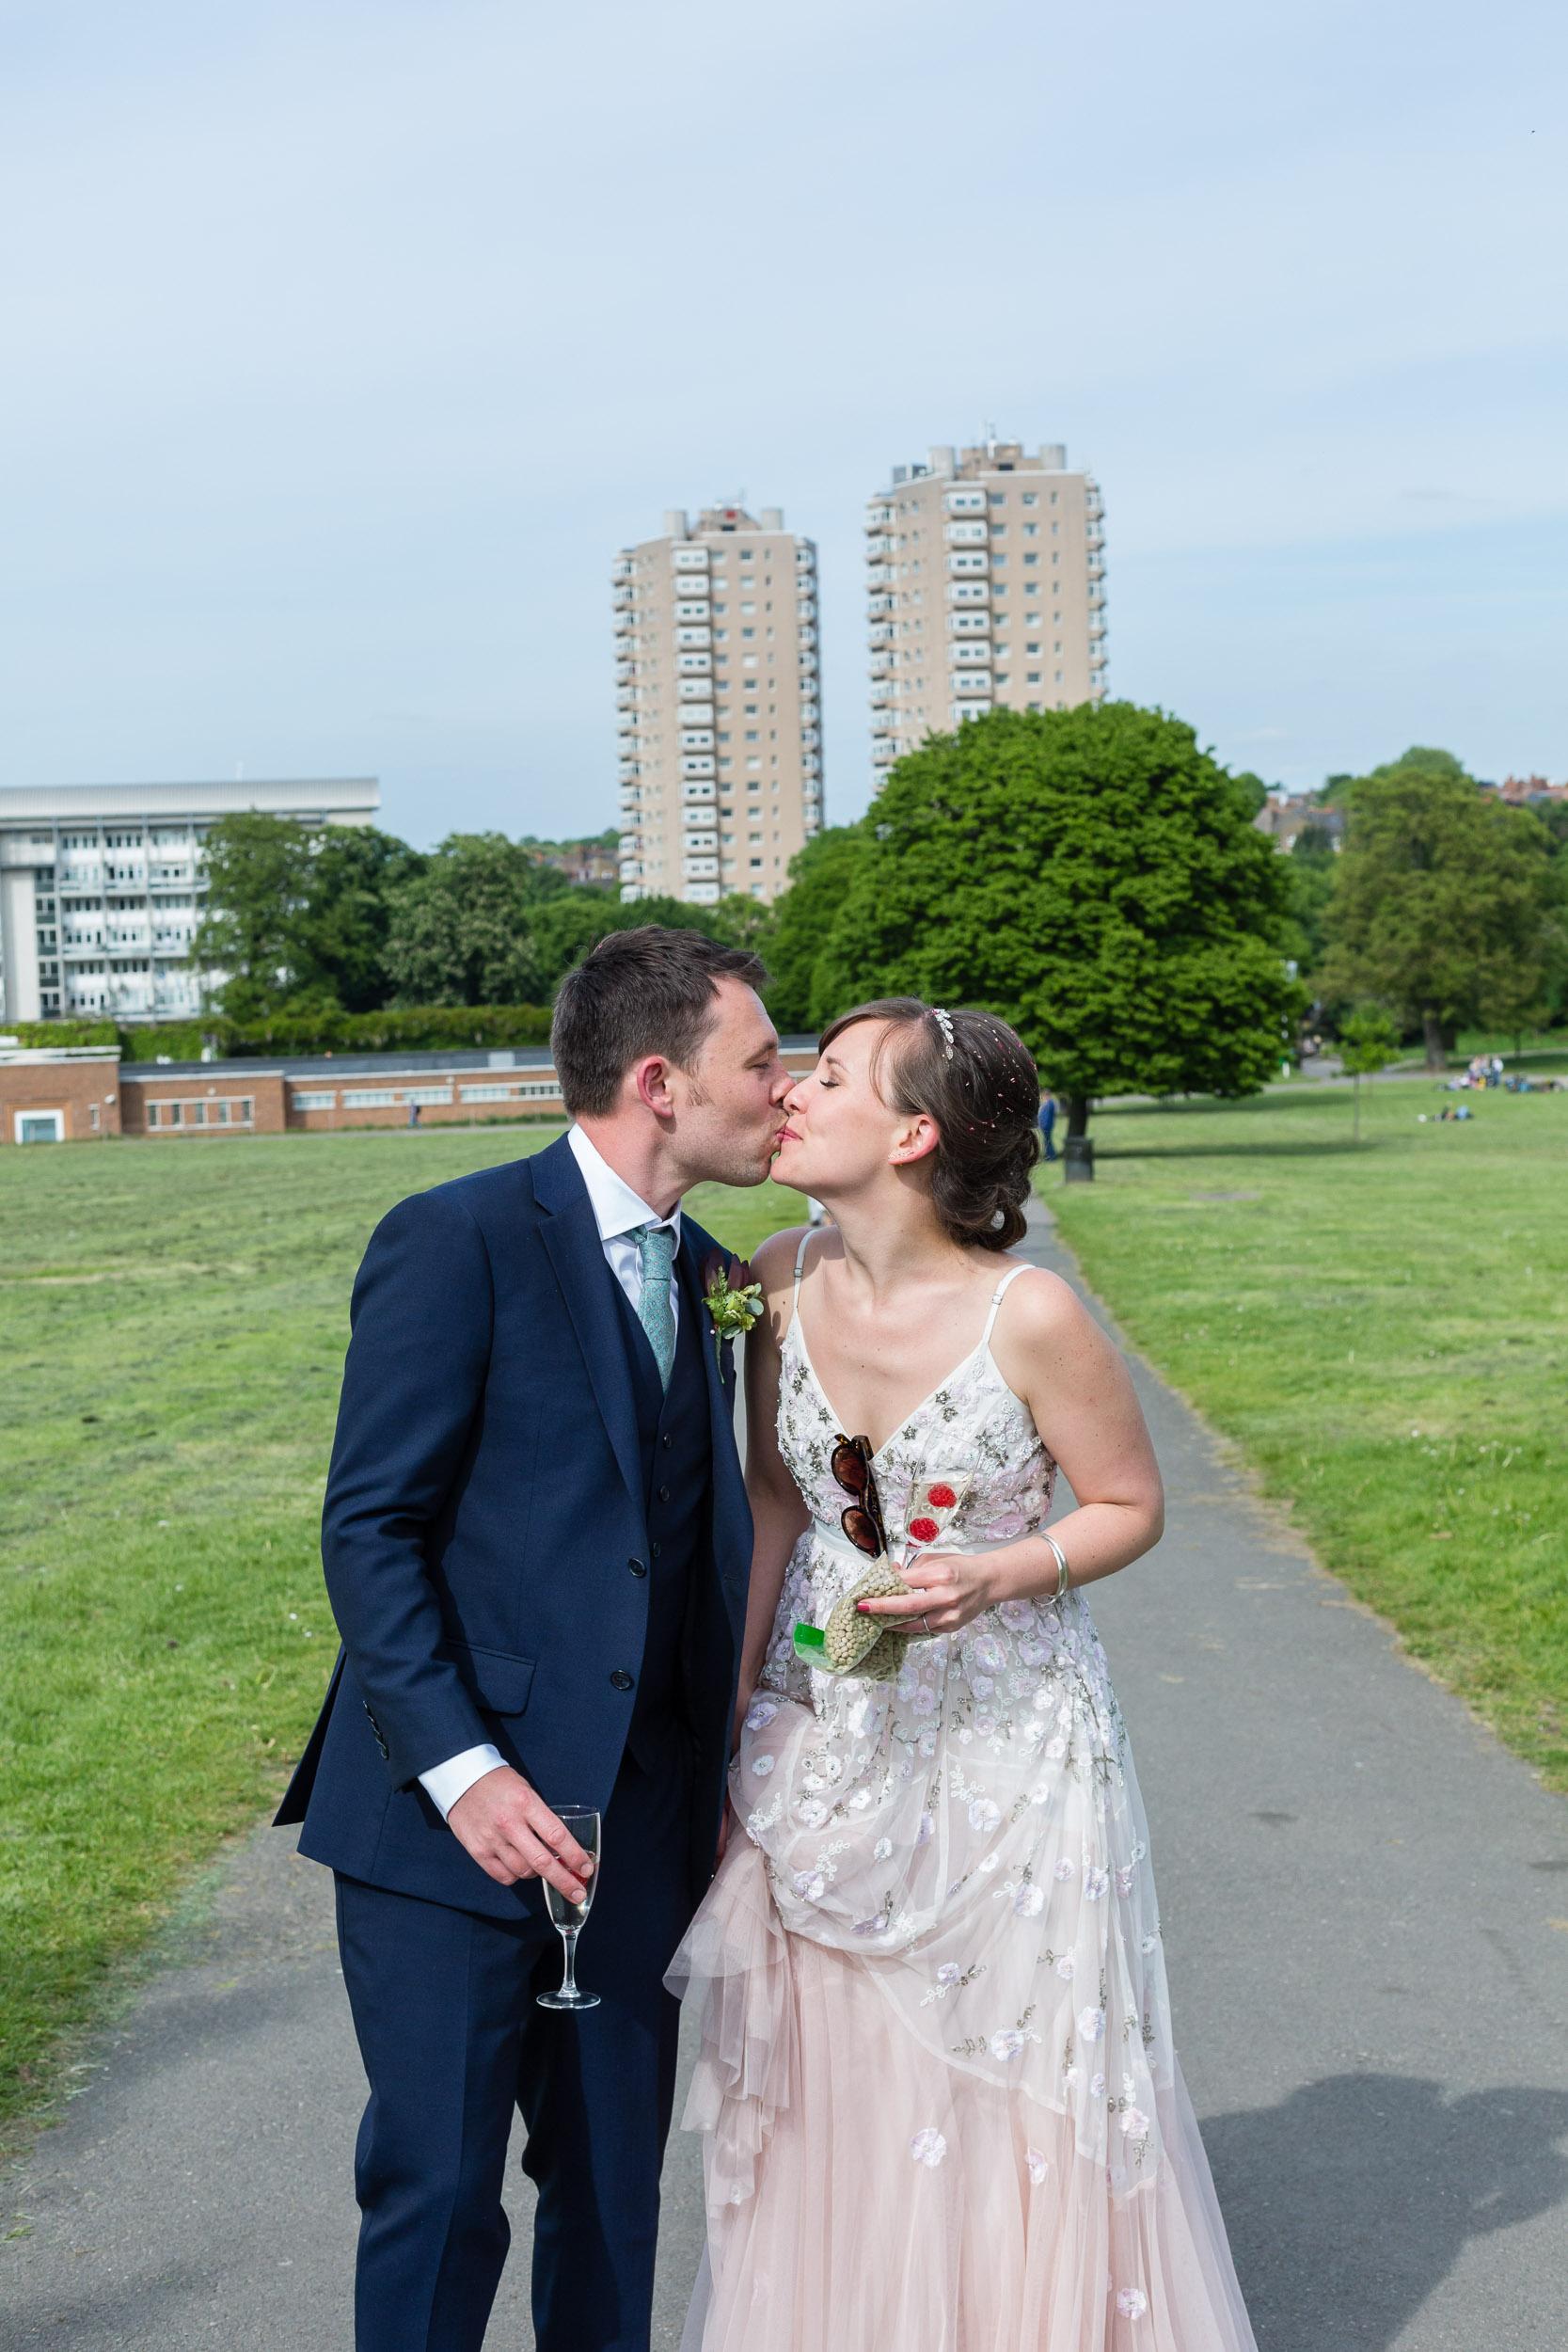 brockwell-lido-brixton-herne-hill-wedding-251.jpg